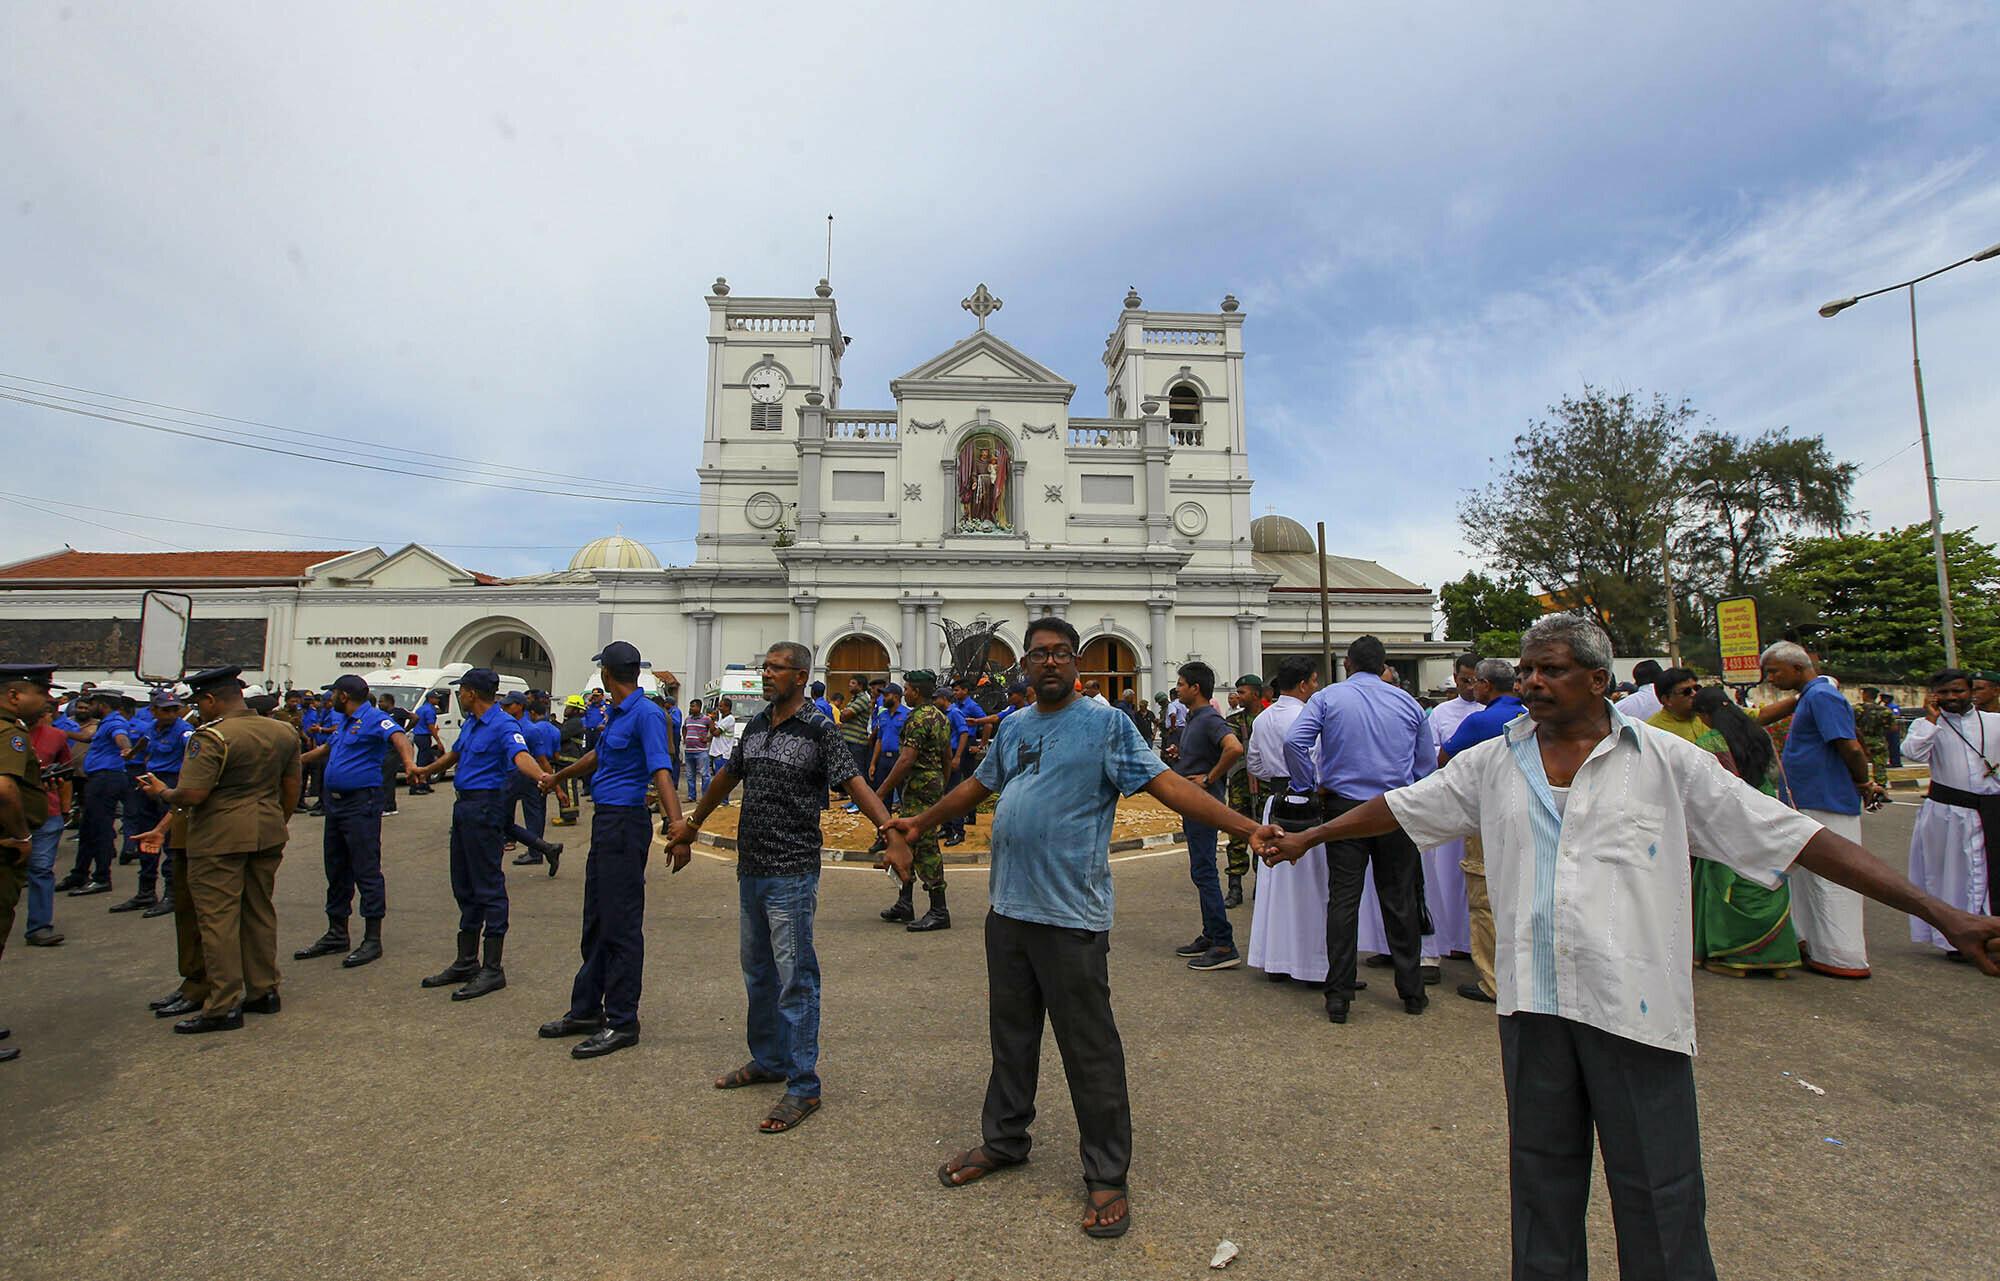 Sri_Lanka_Church_Blasts_53490-159532.jpg85315720